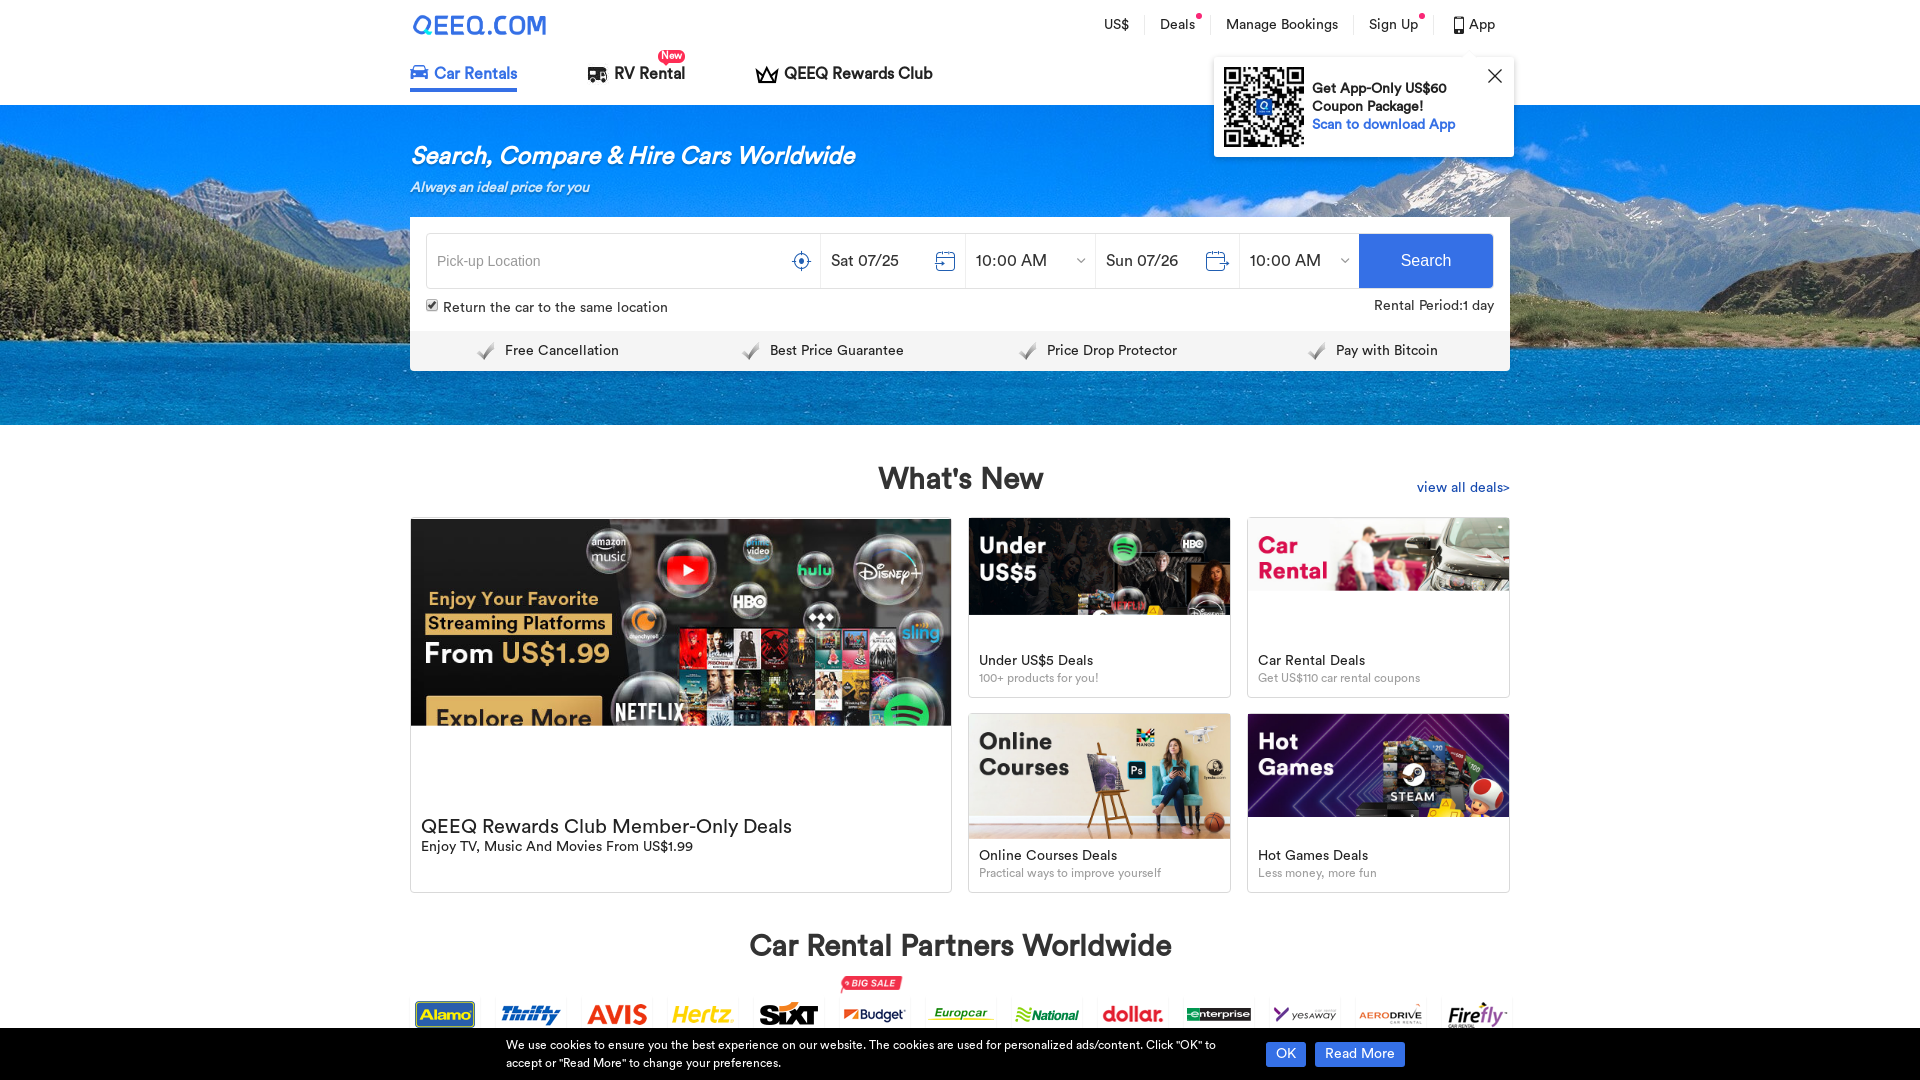 QEEQ website